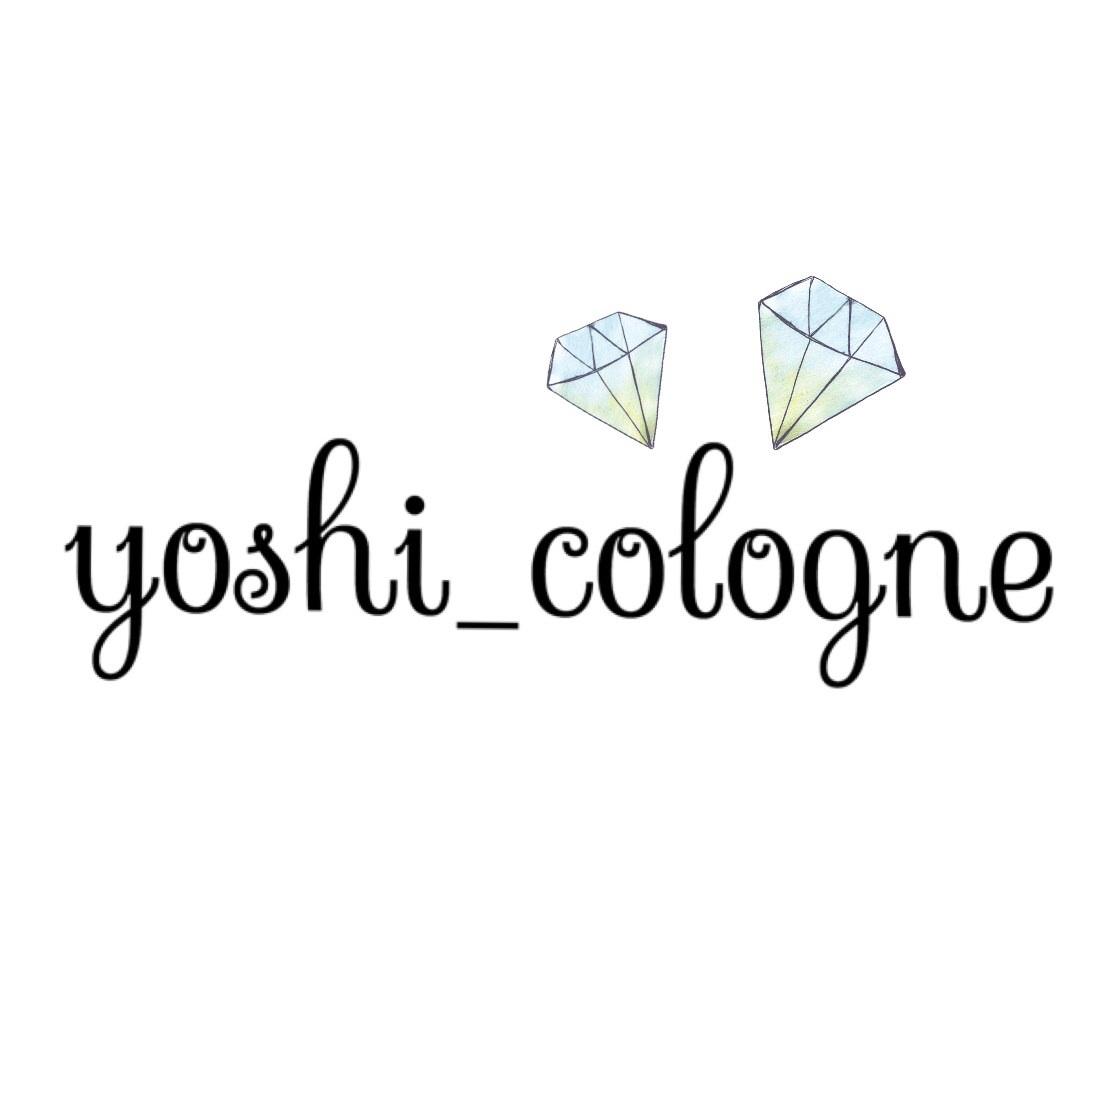 yoshi_cologne